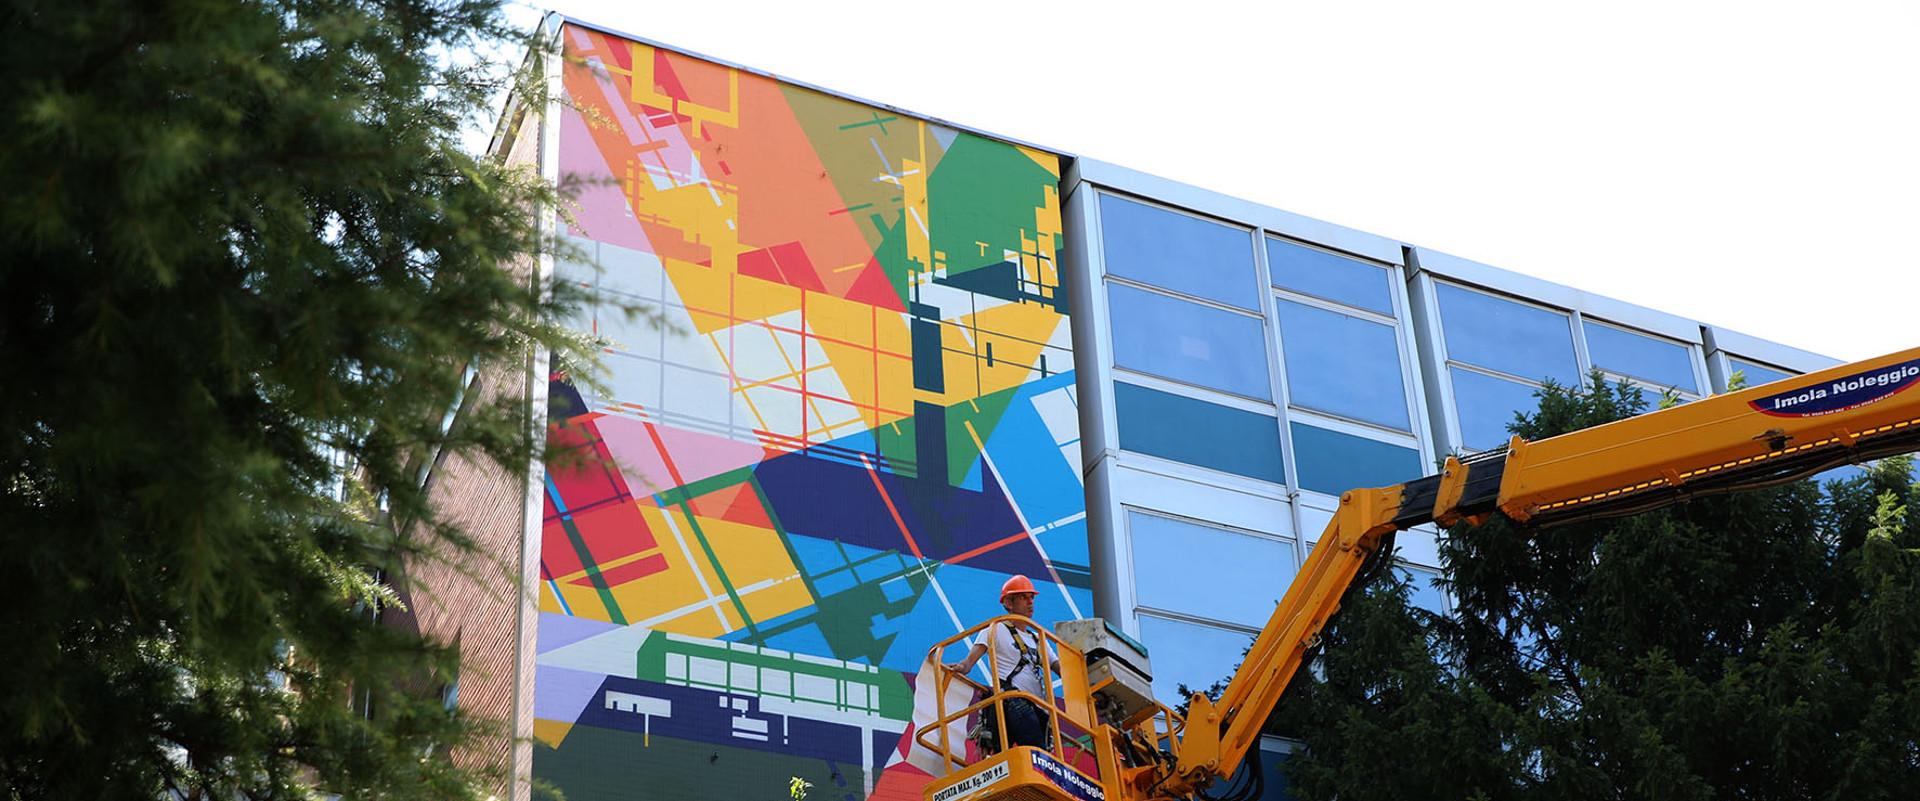 La Pittura Moderna Imola.Portale Restart 2018 Artisti Internazionali Per